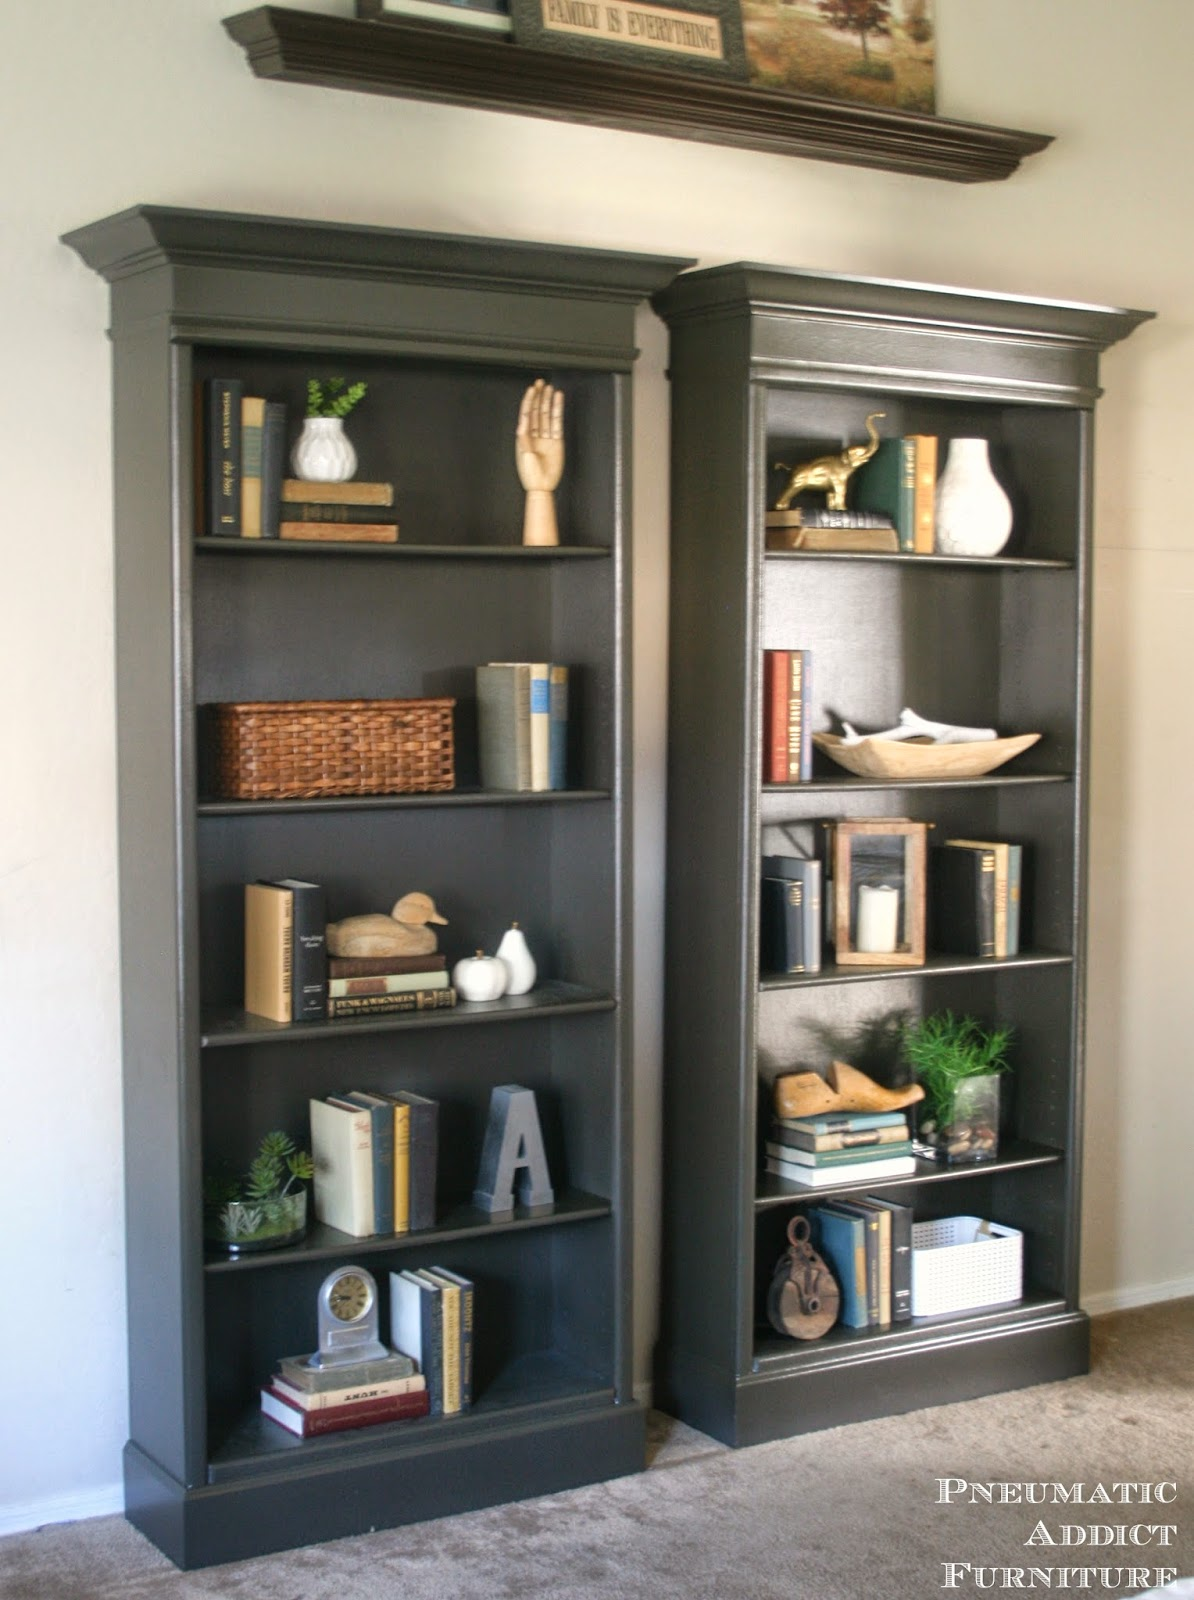 pneumatic addict how to upgrade bookshelves